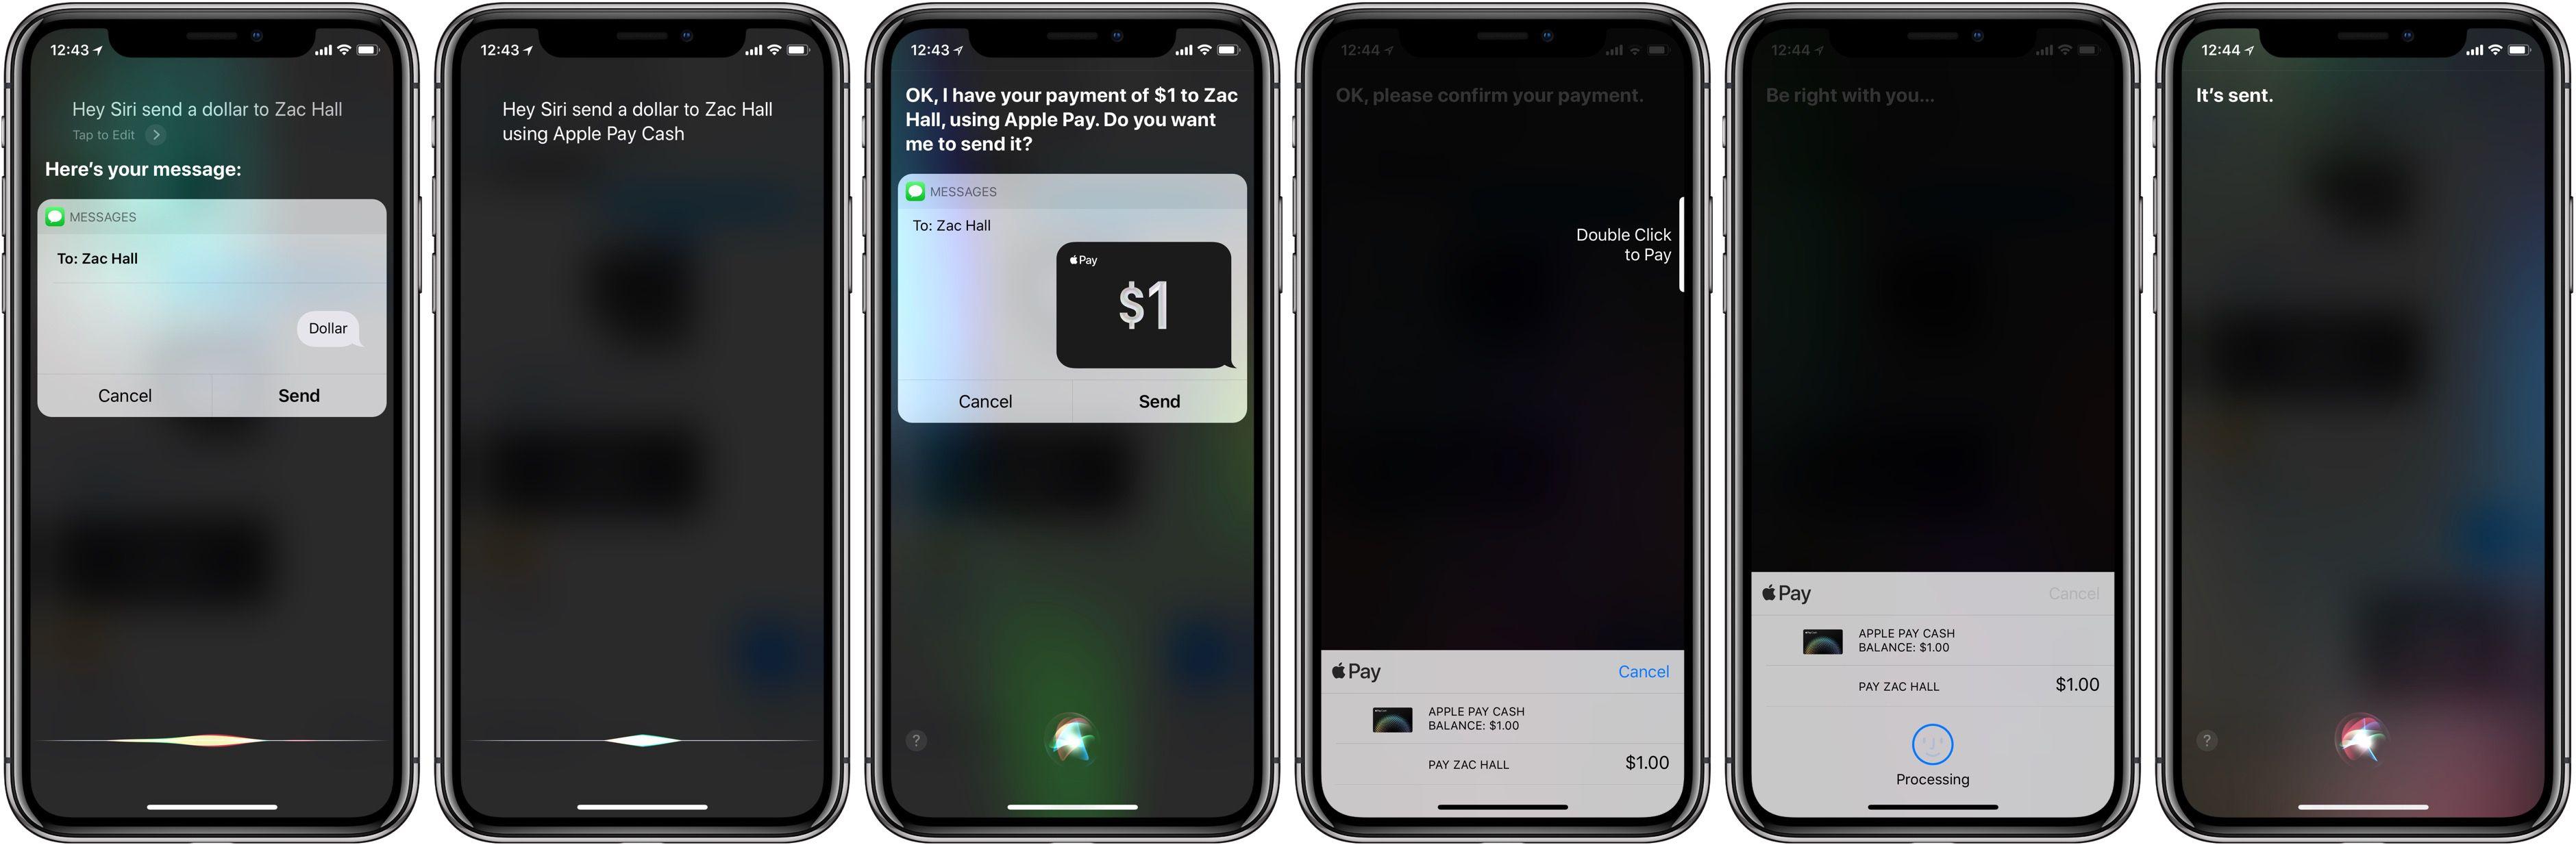 Apple Pay cash walkthrough 8